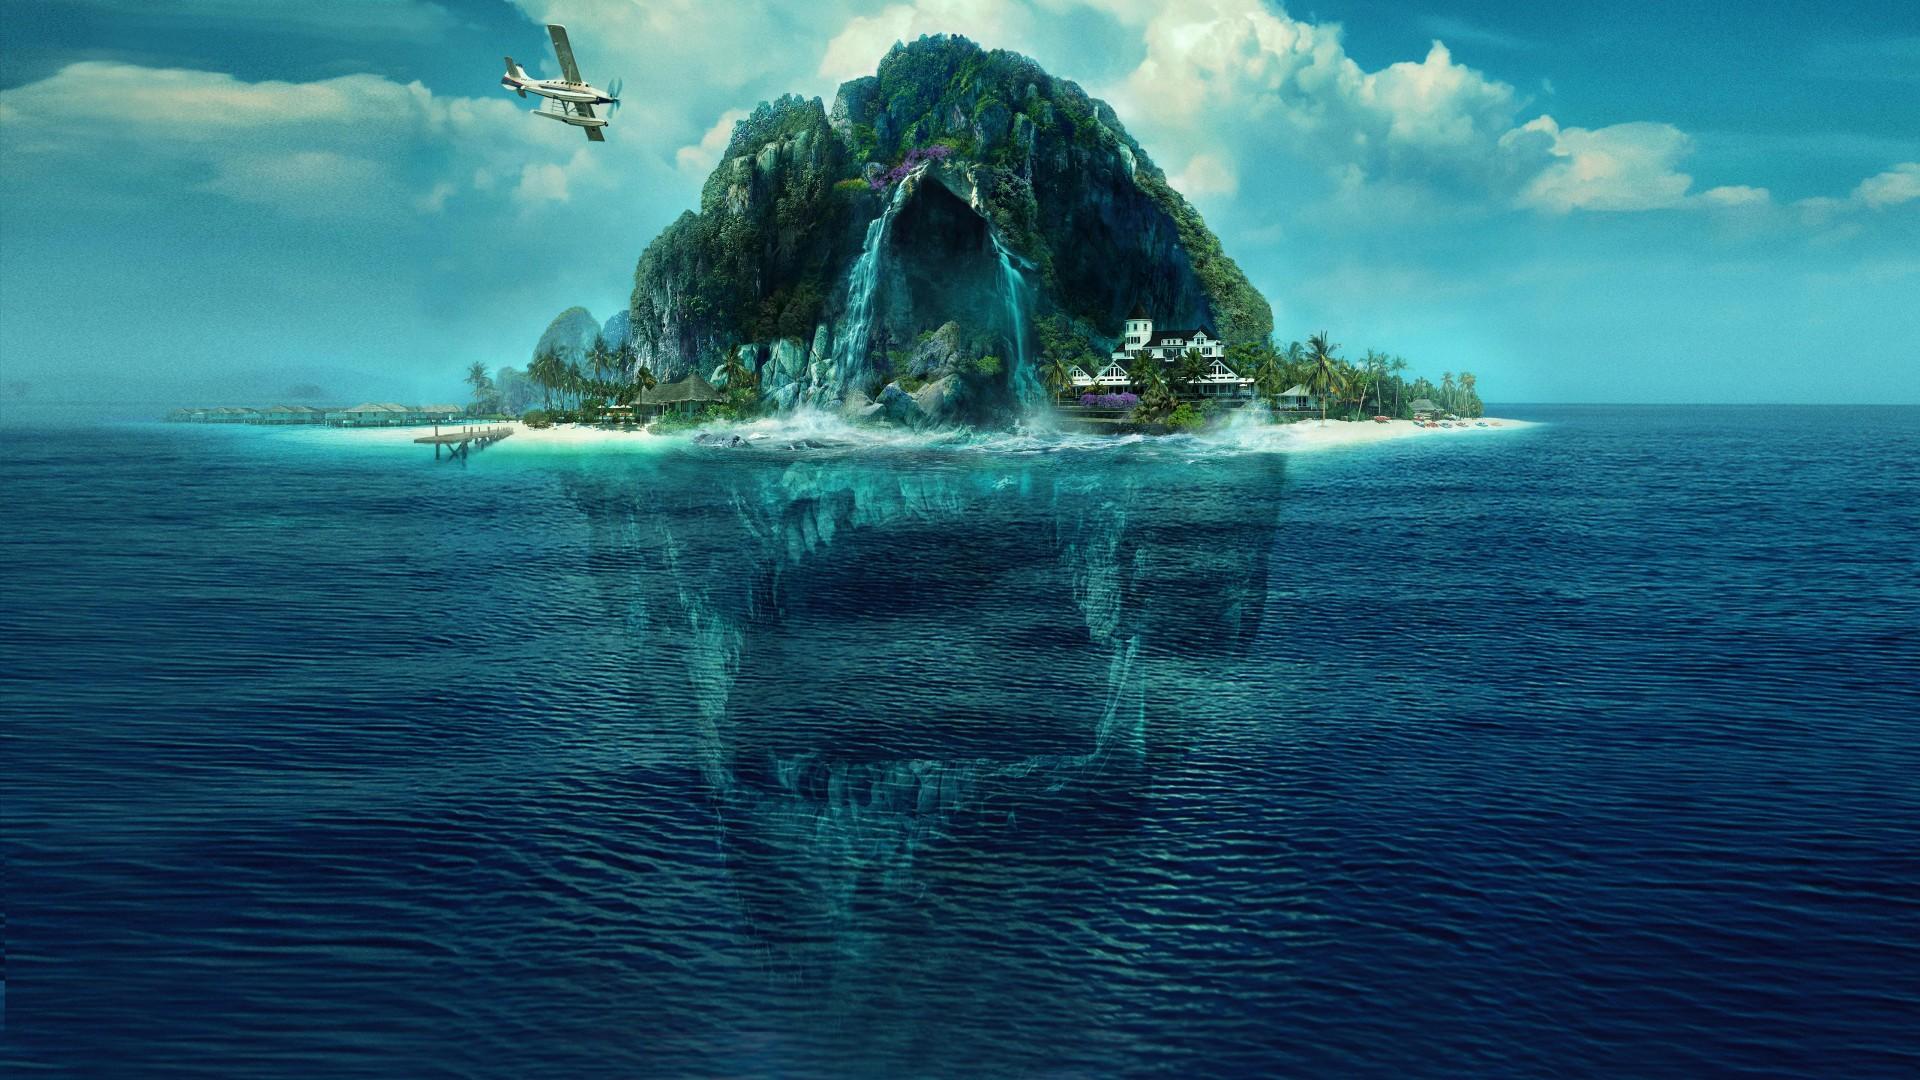 Fantasy Island 2020 4K 5K HD desktop wallpaper Widescreen High 1920x1080